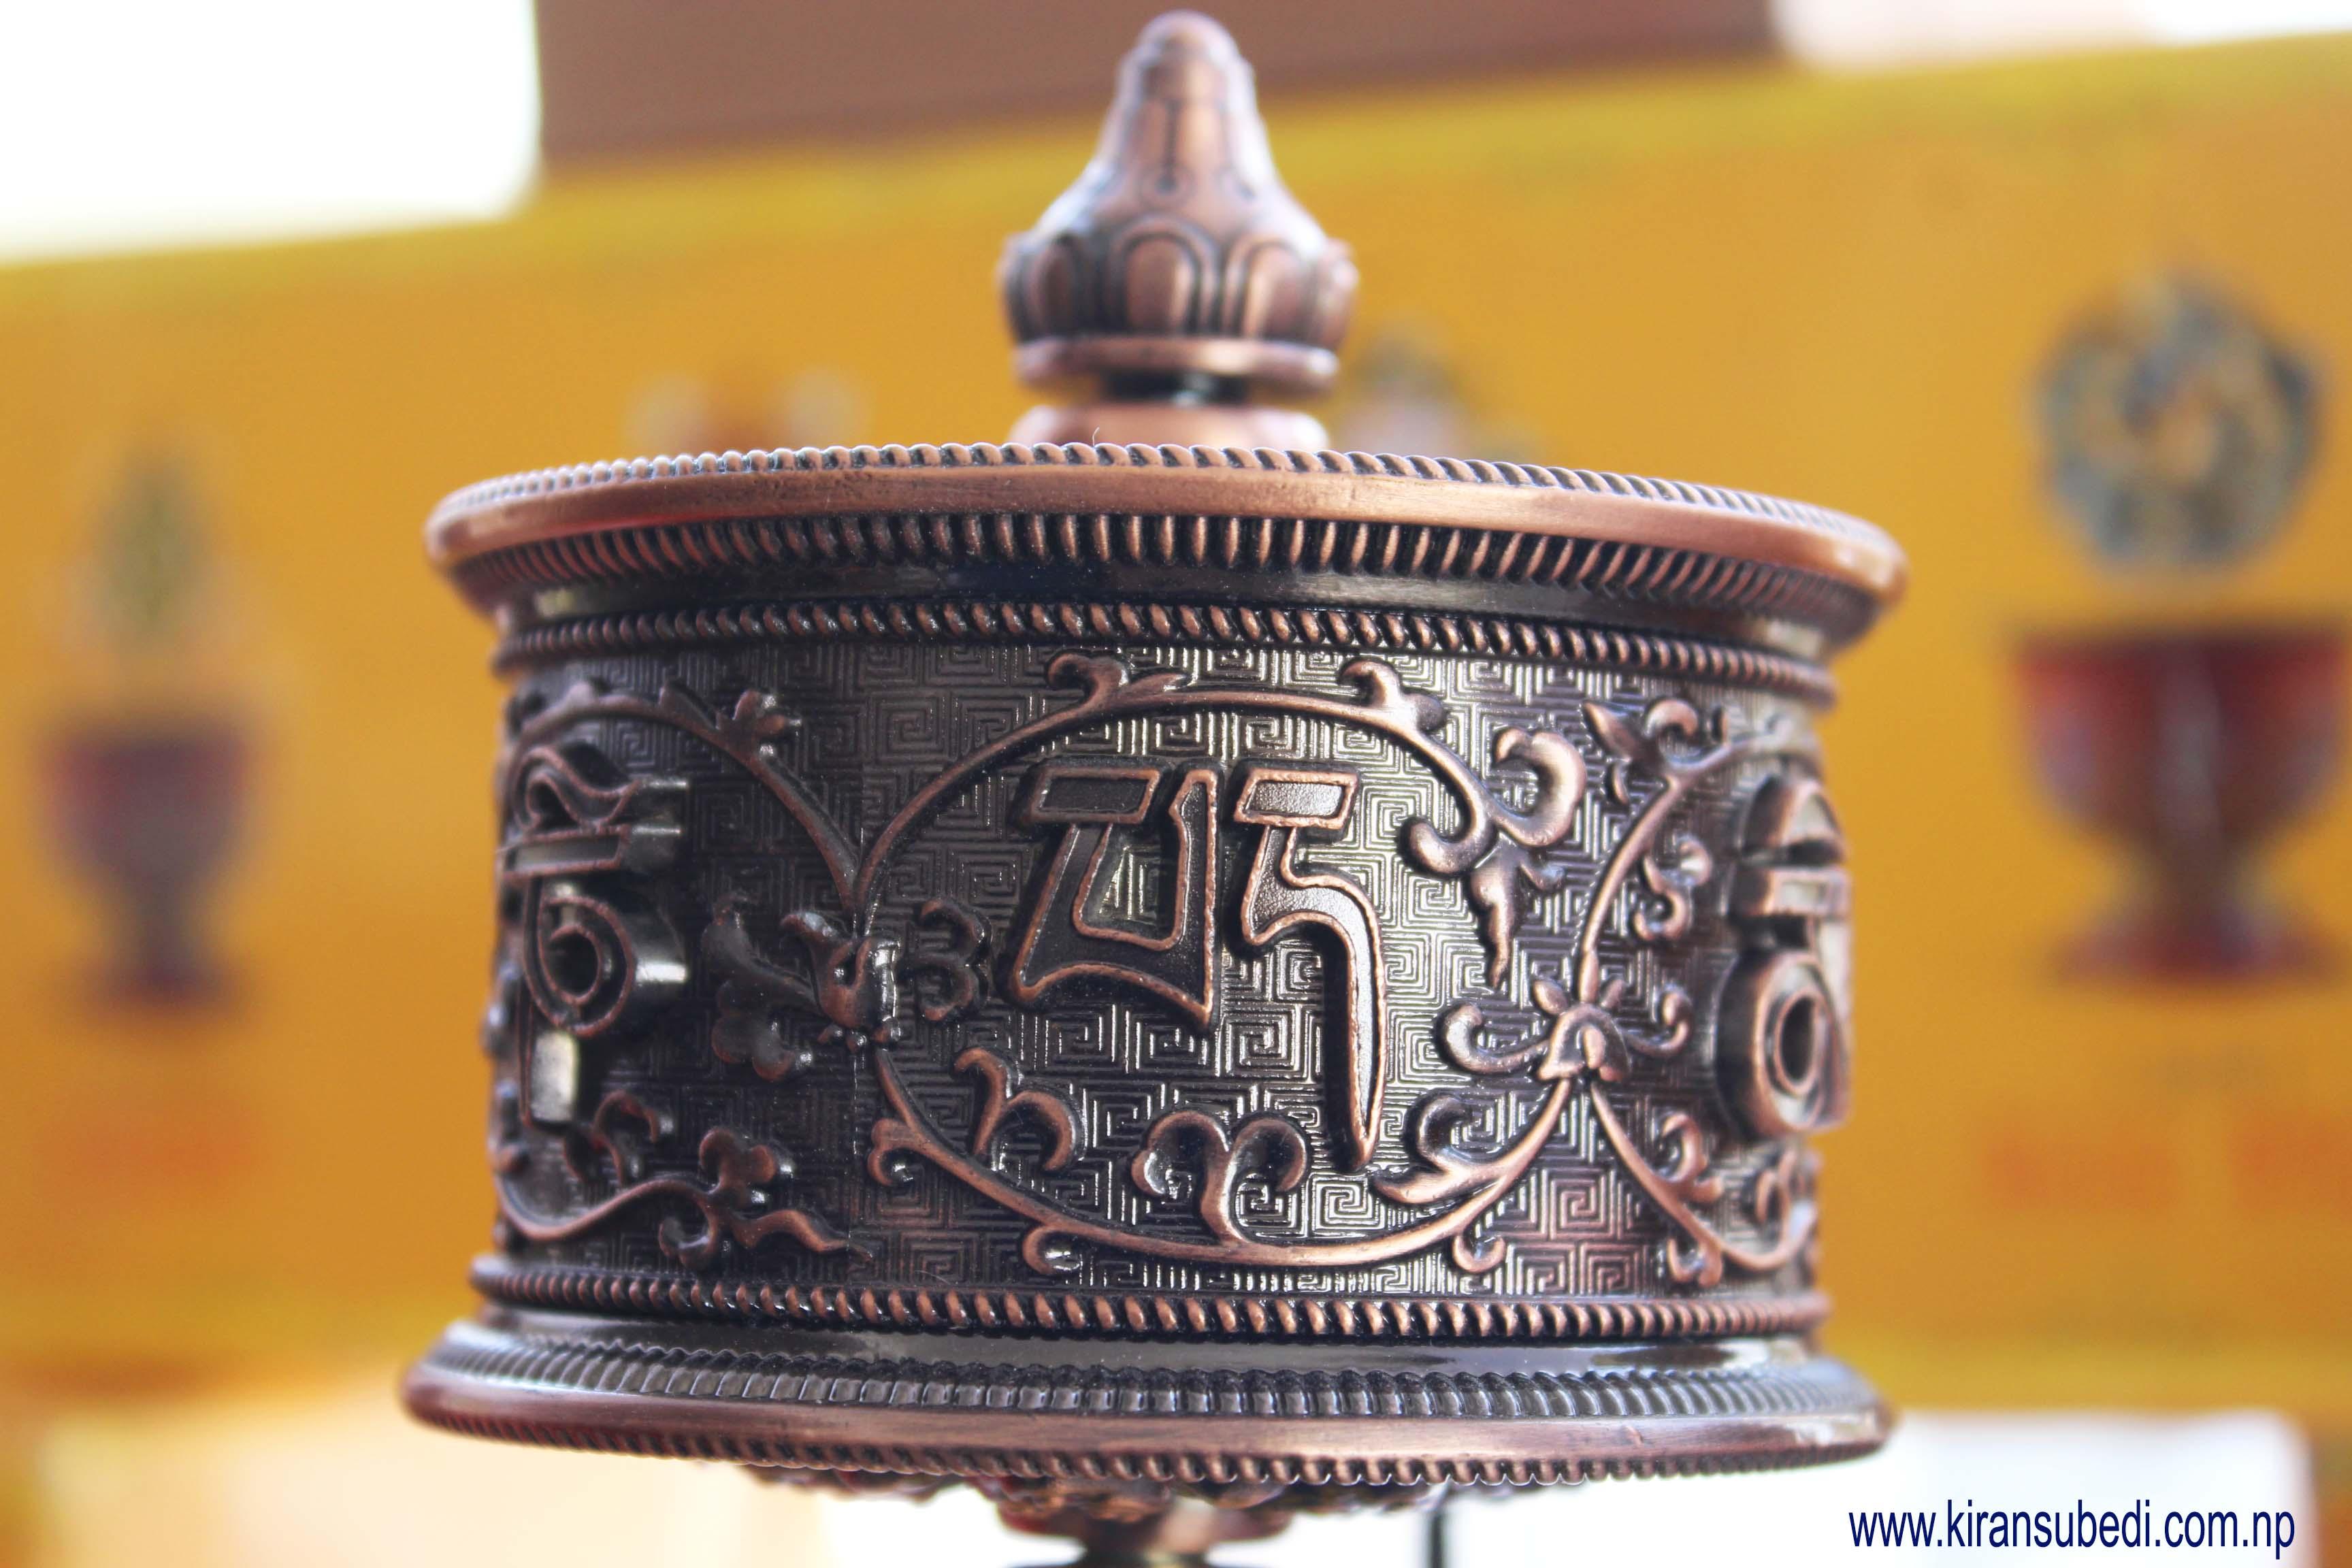 Buddhist Prayer Wheel, buddhist prayer wheel necklace buddhist prayer wheel history buddhist prayer wheel online buddhist prayer wheels meaning